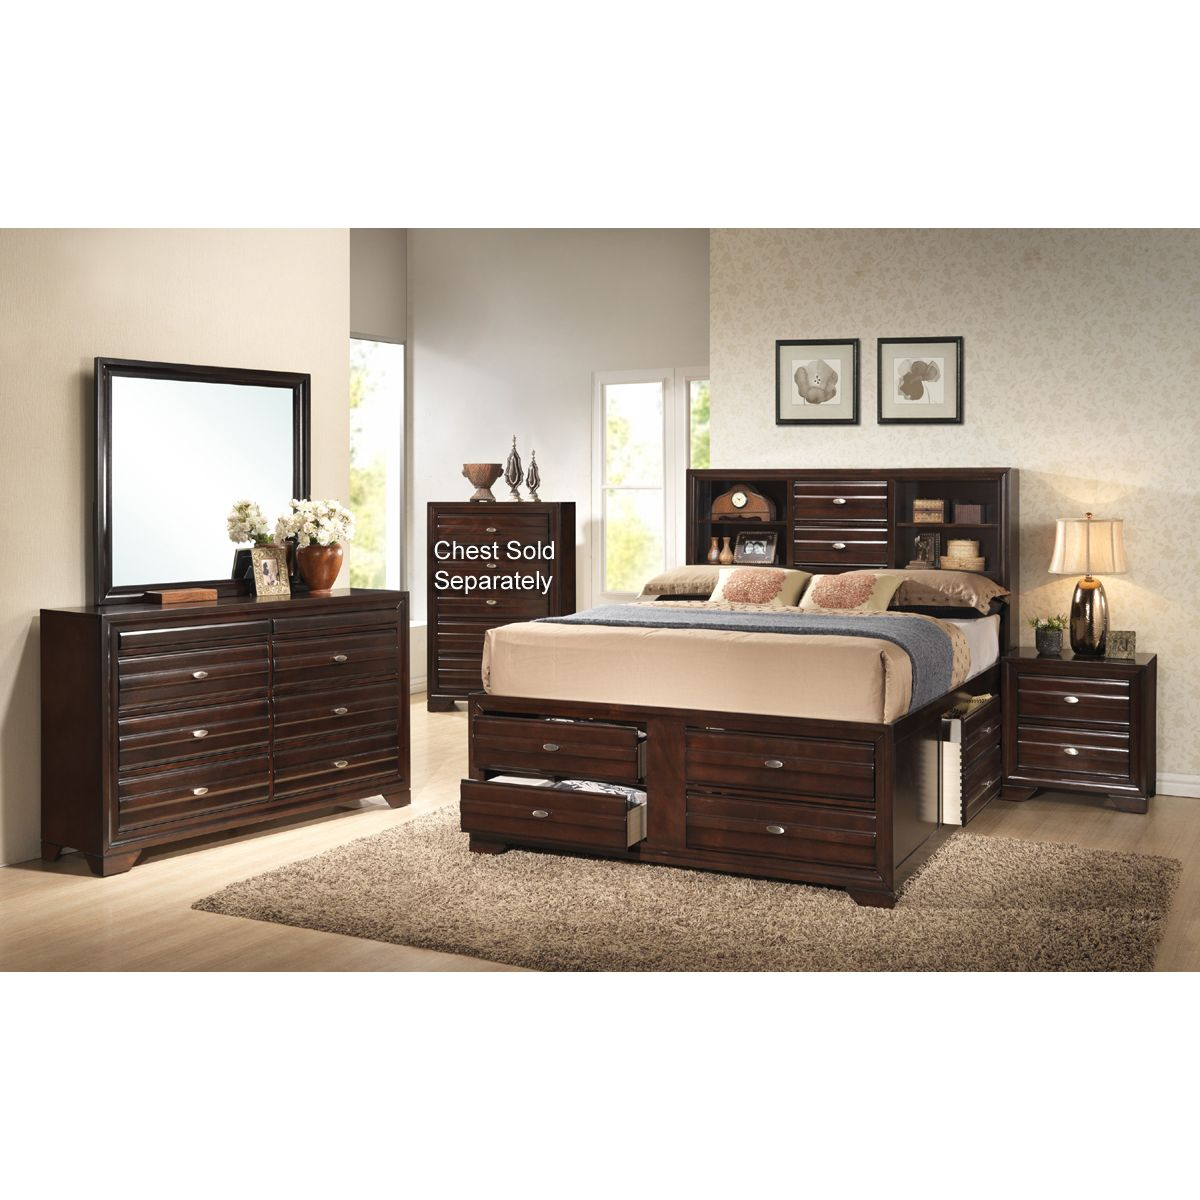 7 piece bedroom furniture sets photo - 1